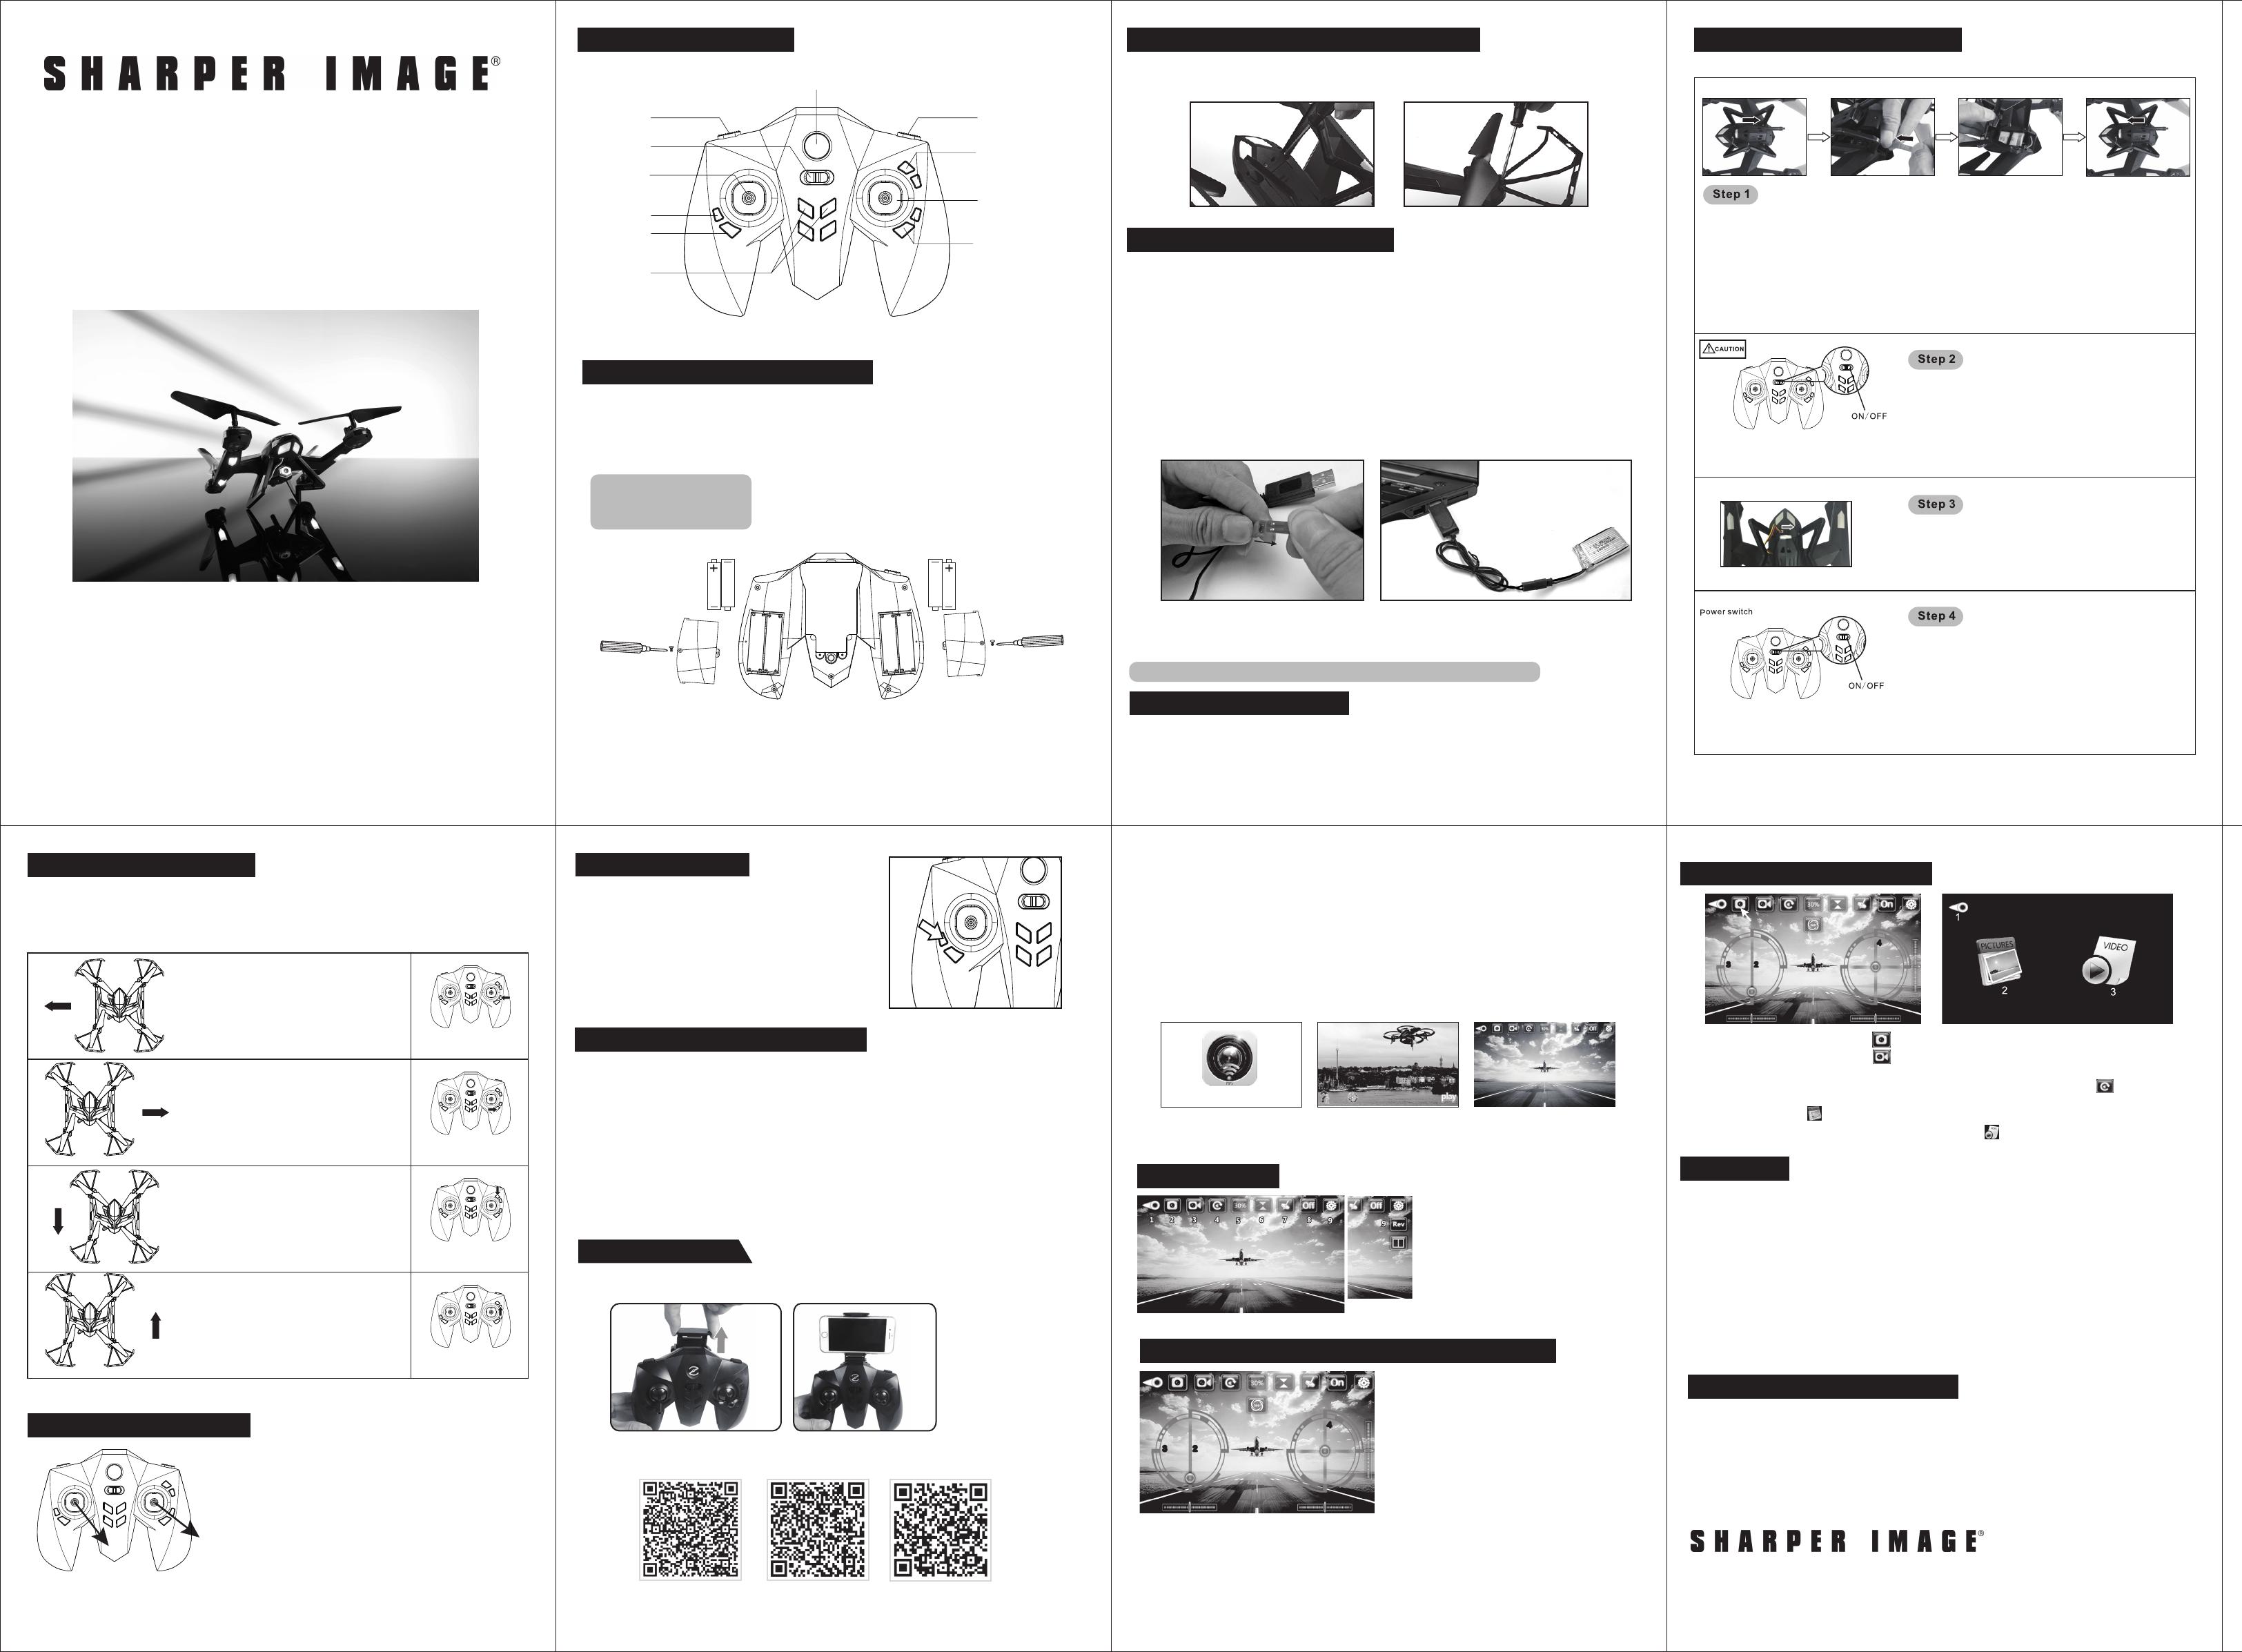 Sharper Image Qst1601 Manual 206089